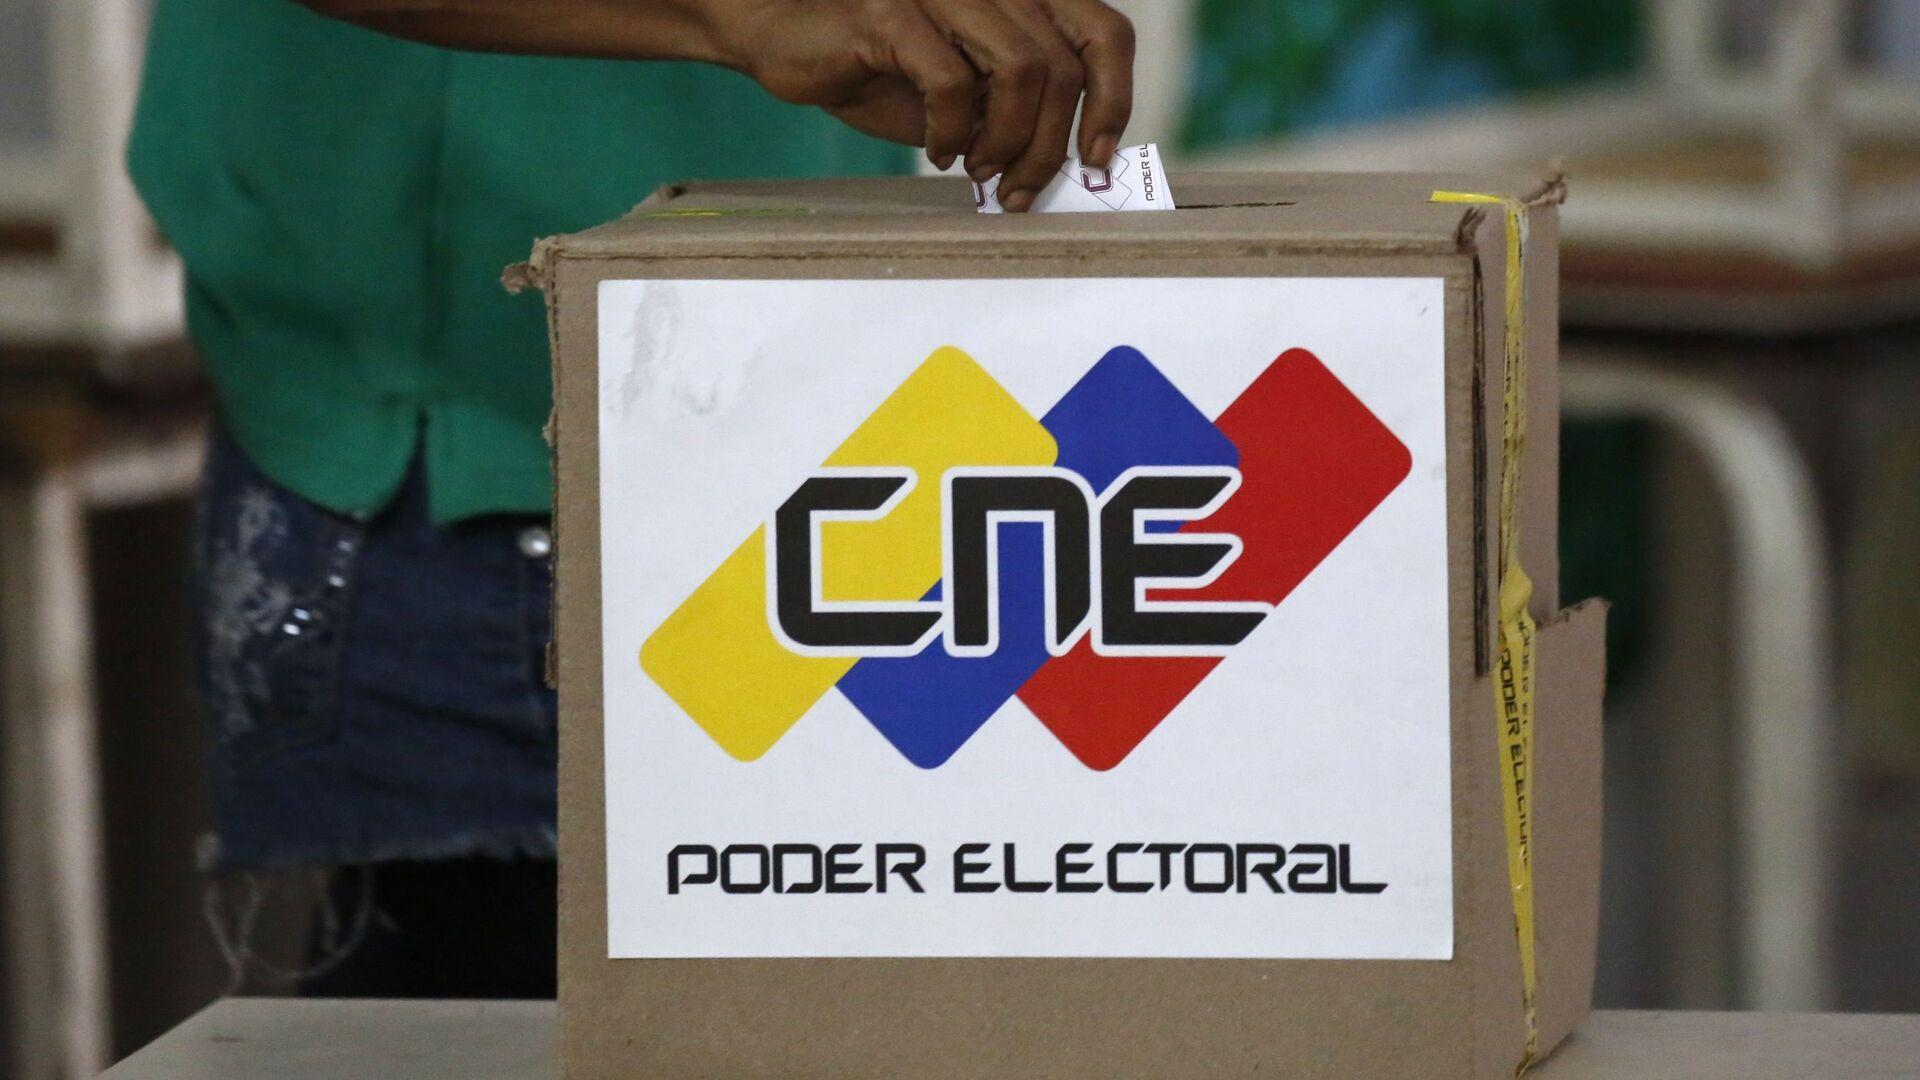 A voter casts a ballot during the Constituent Assembly election in Caracas, Venezuela - Sputnik Mundo, 1920, 06.10.2021